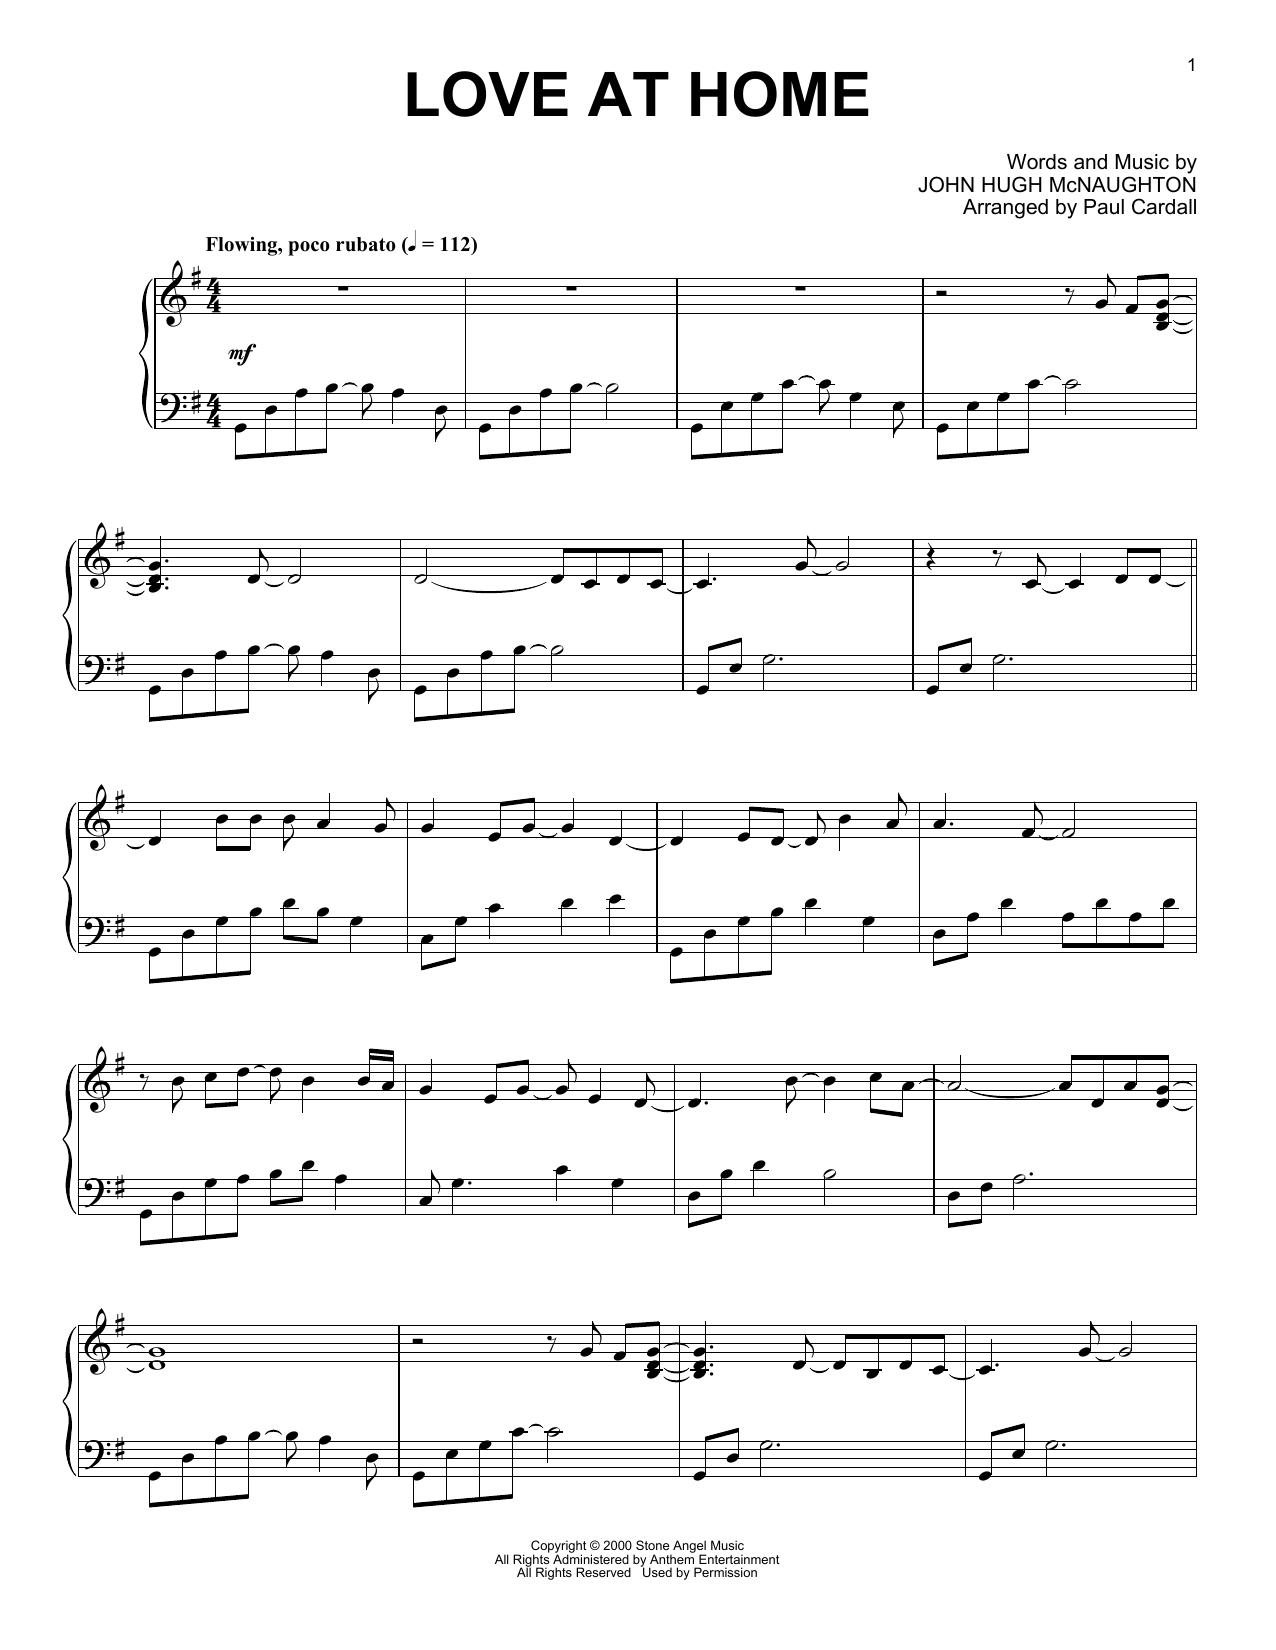 John Hugh McNaughton Love At Home (arr. Paul Cardall) sheet music notes and chords. Download Printable PDF.